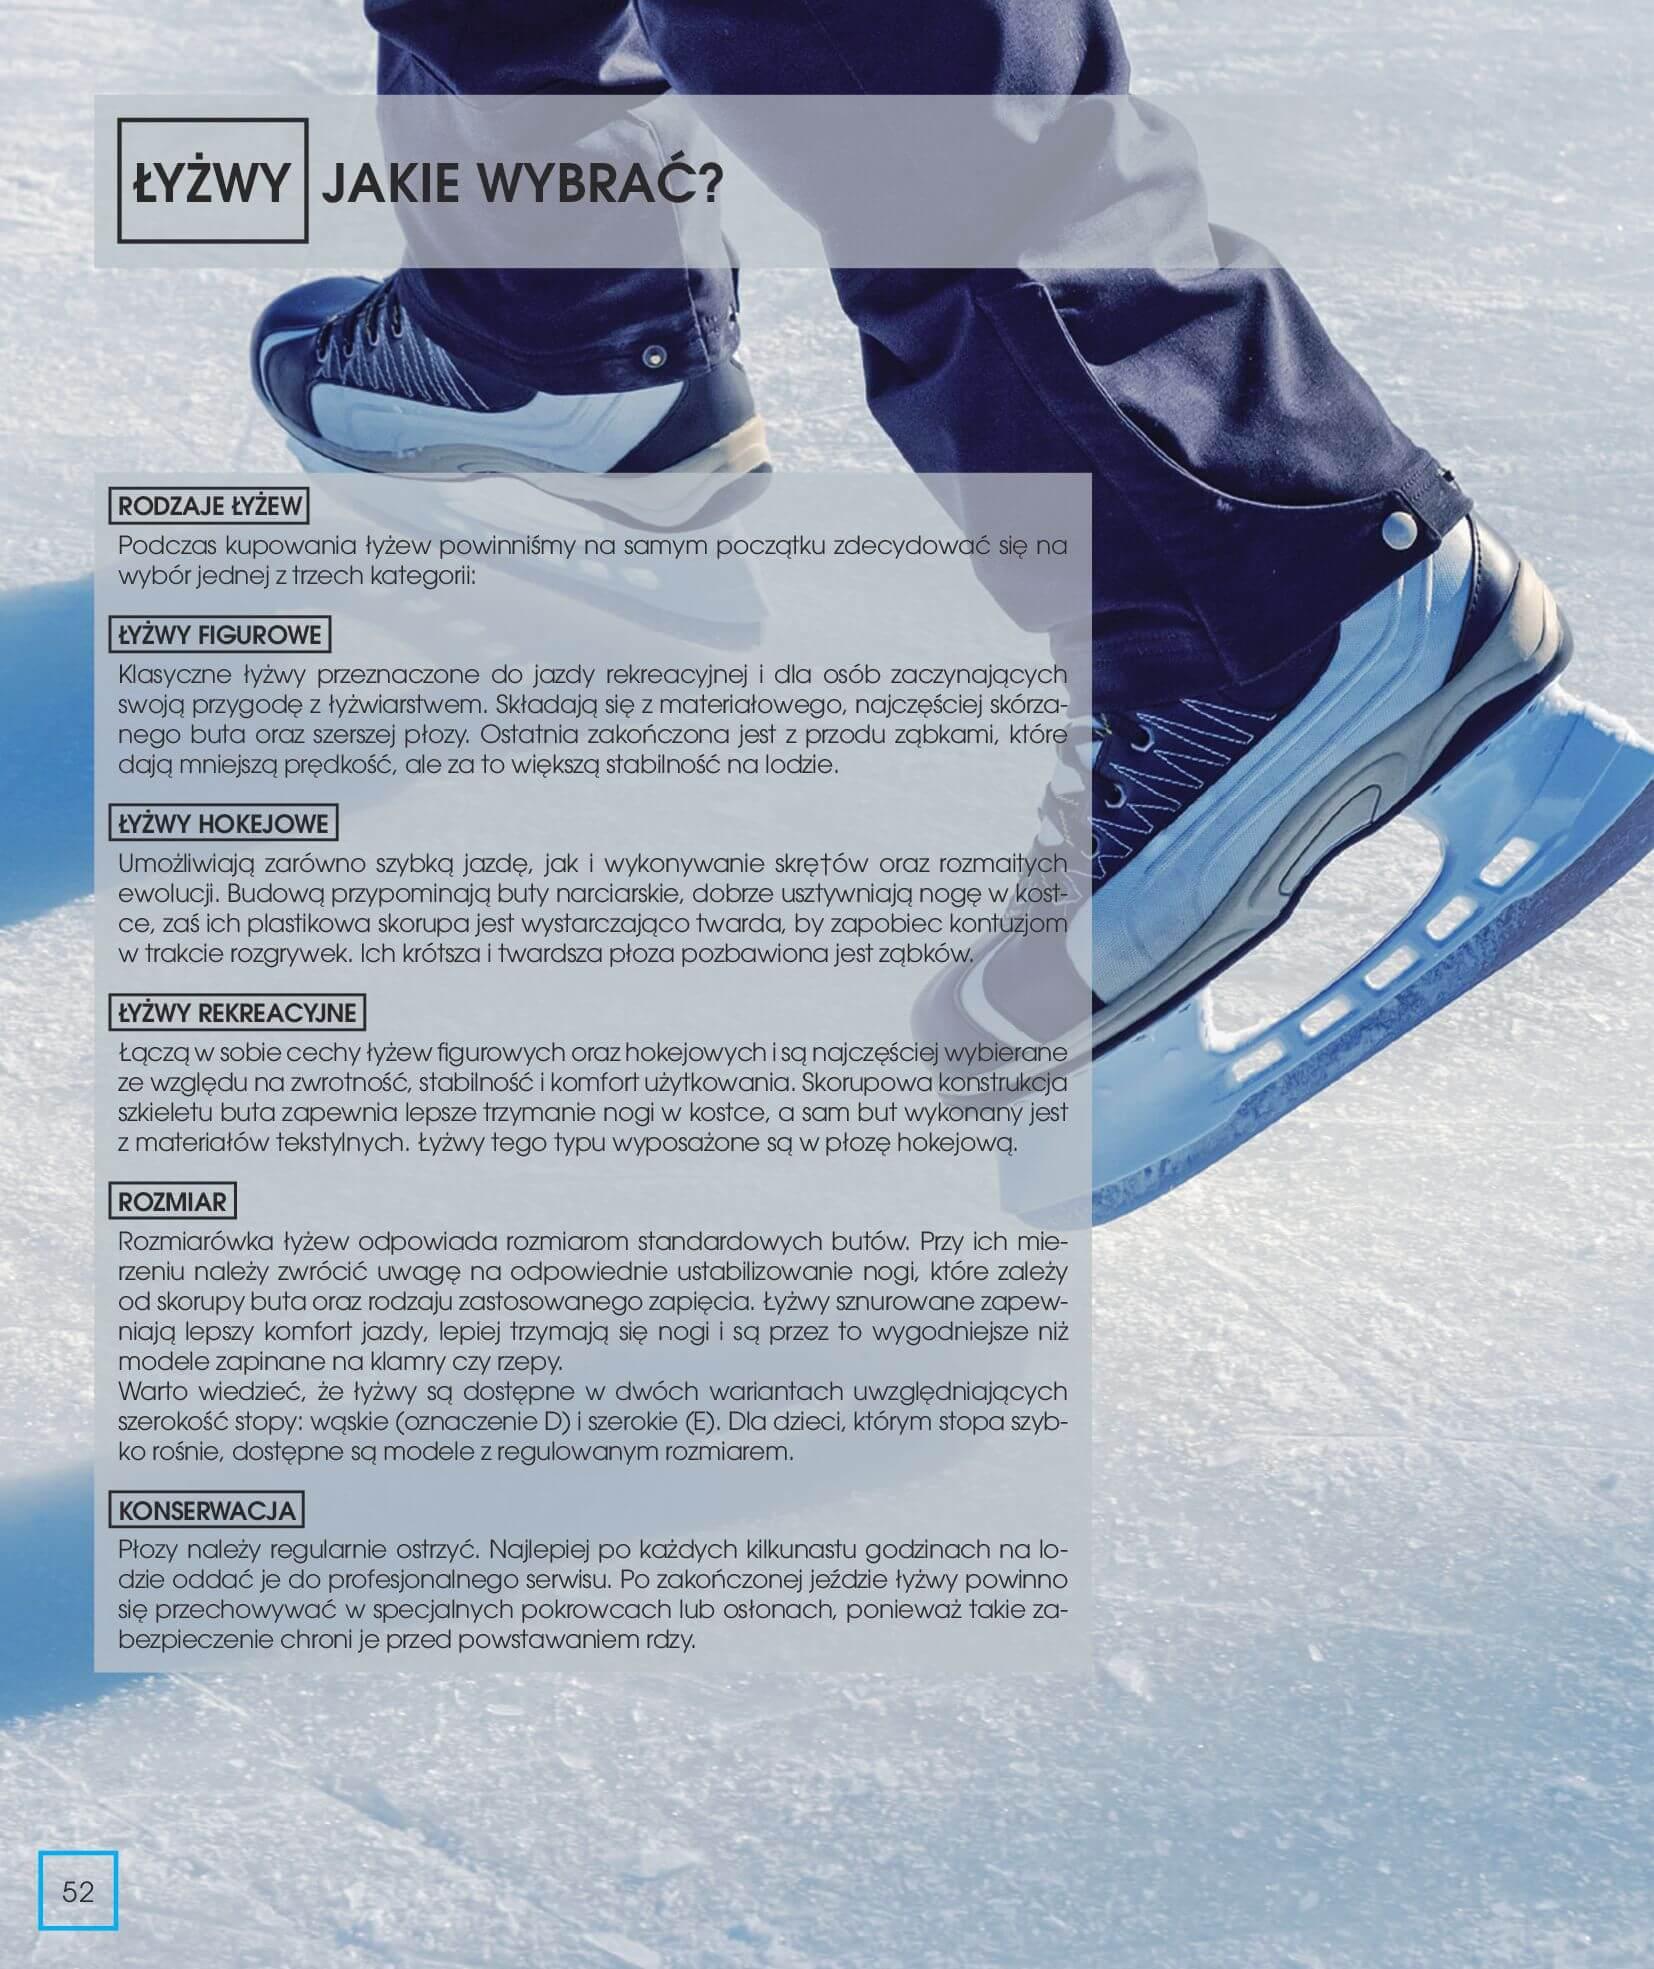 Gazetka Go Sport - Katalog Zima 2017/2018-12.11.2017-28.02.2018-page-52